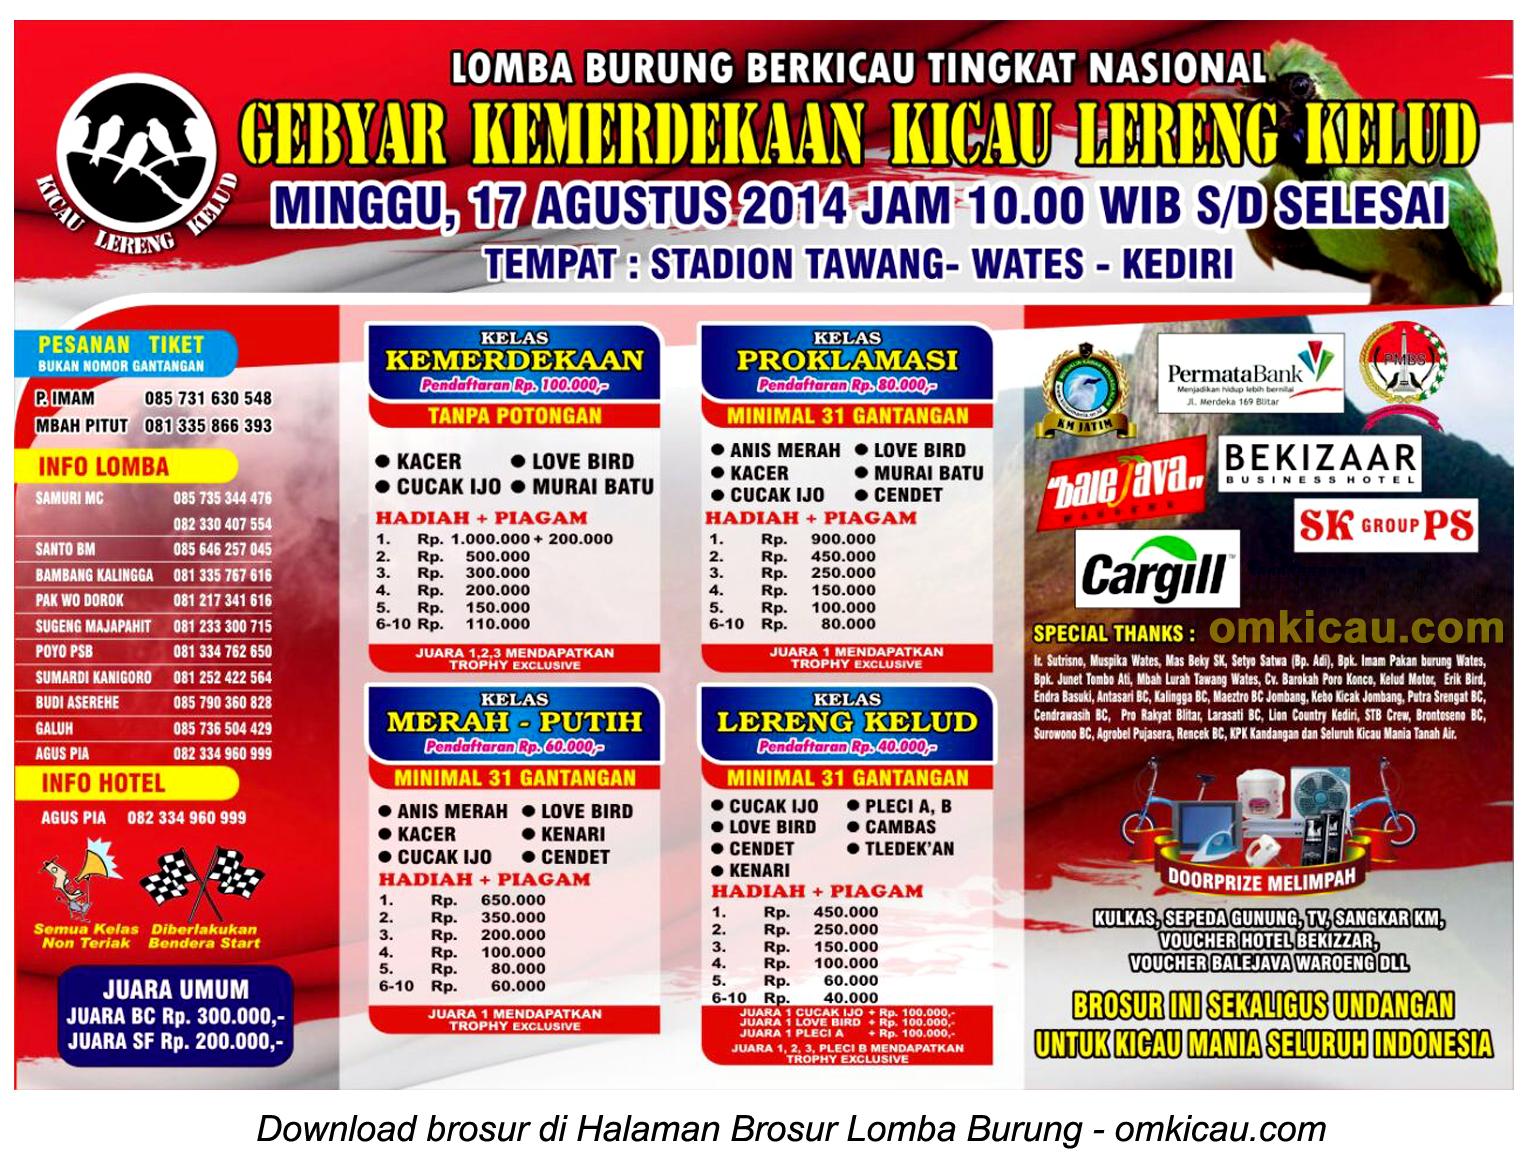 Brosur Lomba Burung Gebyar Kemerdekaan Kicau Lereng Kelud, Kediri, 17 Agustus 2014